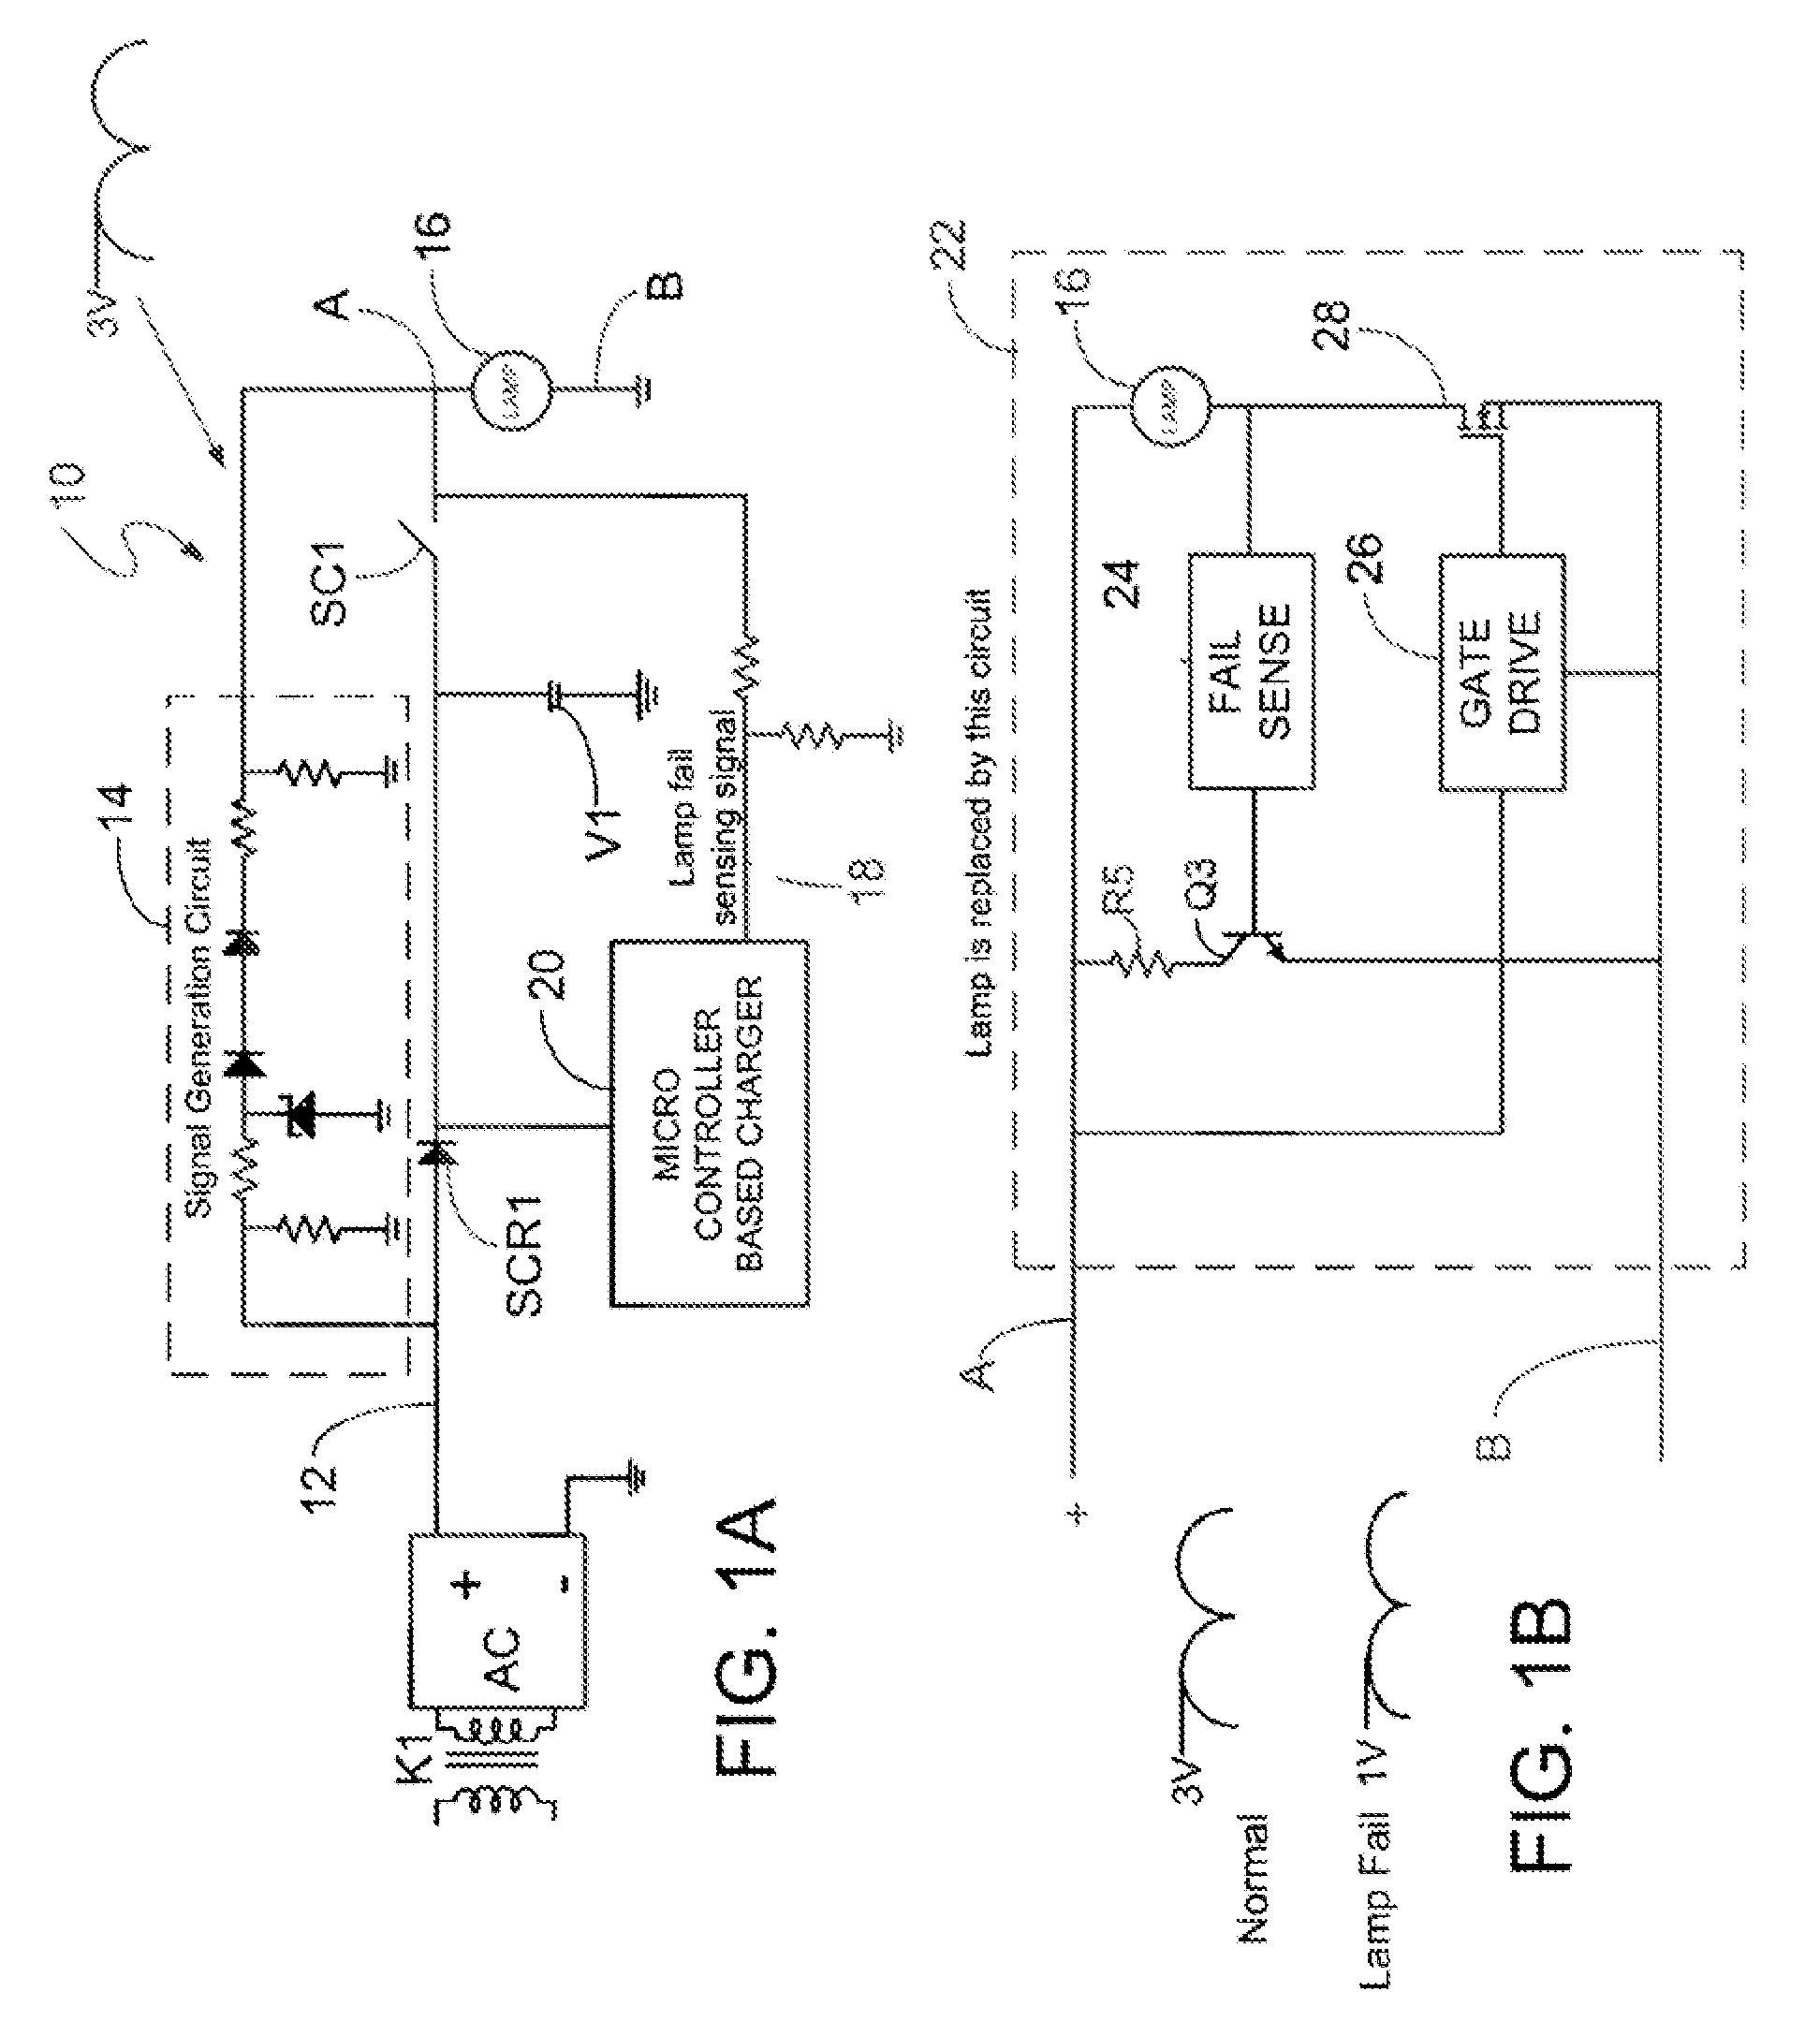 Honda B100 Wiring Diagram